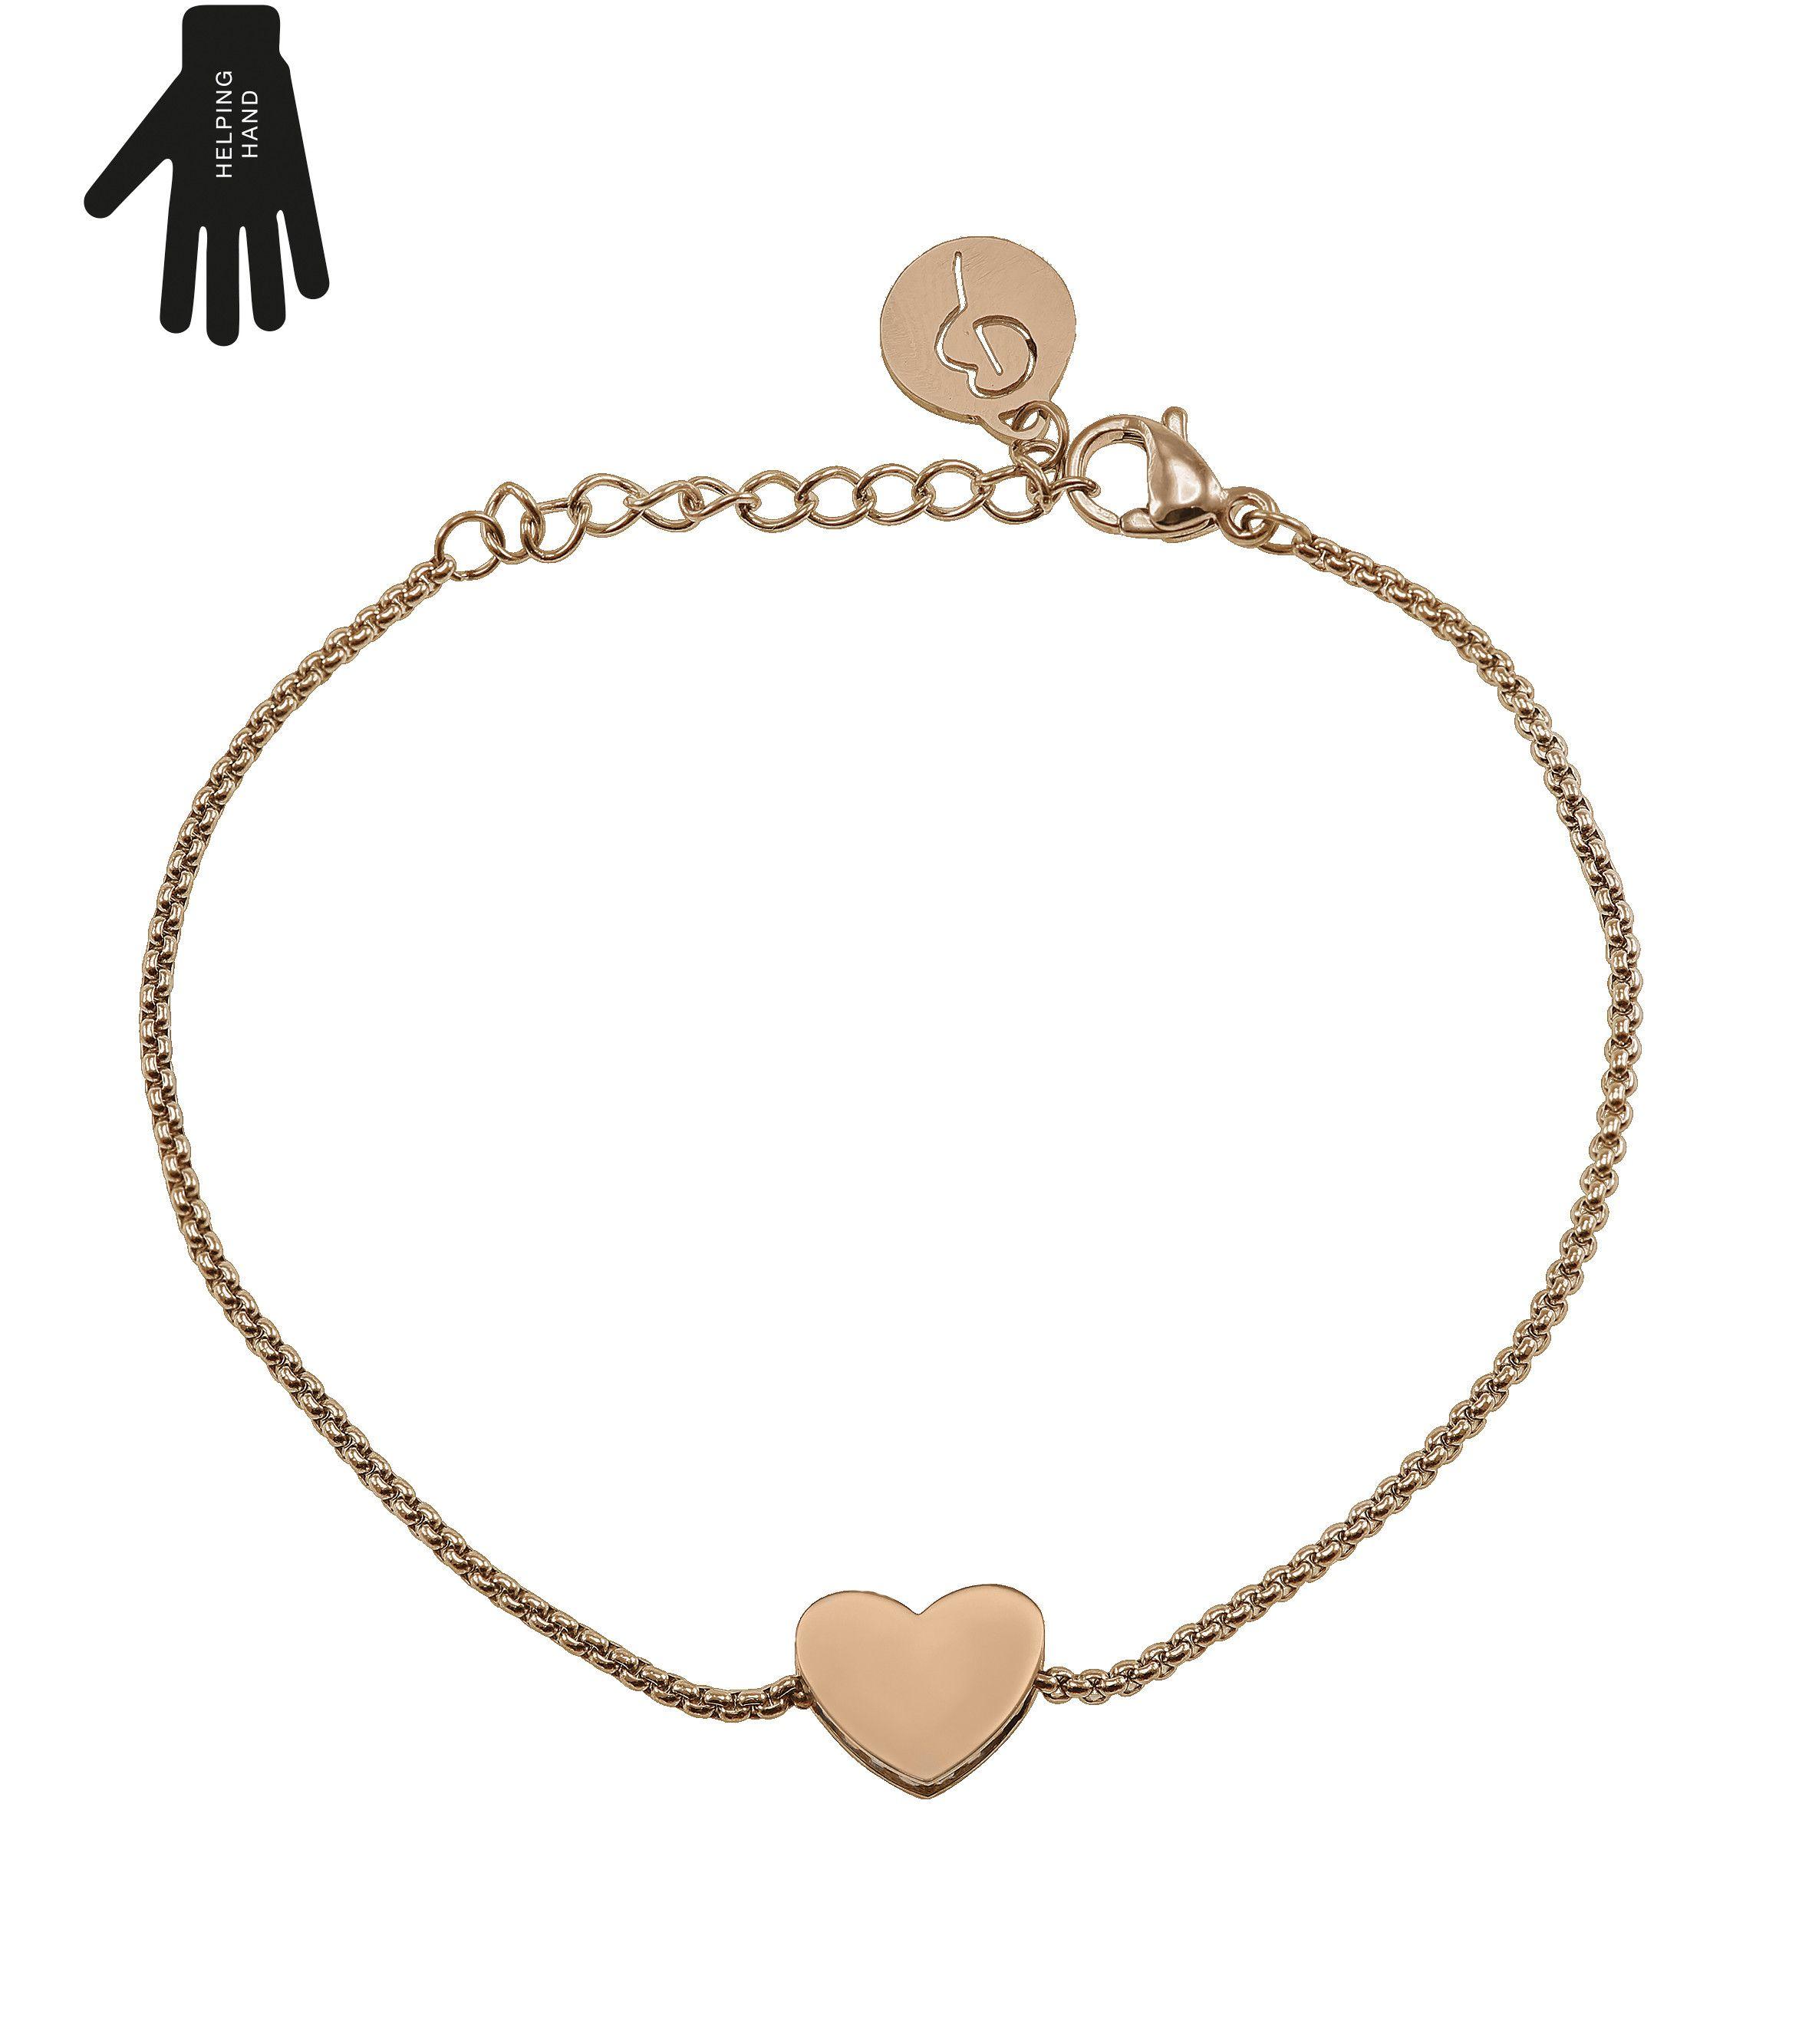 Armband Together Bracelet Rose Gold Edblad Armband Pinterest